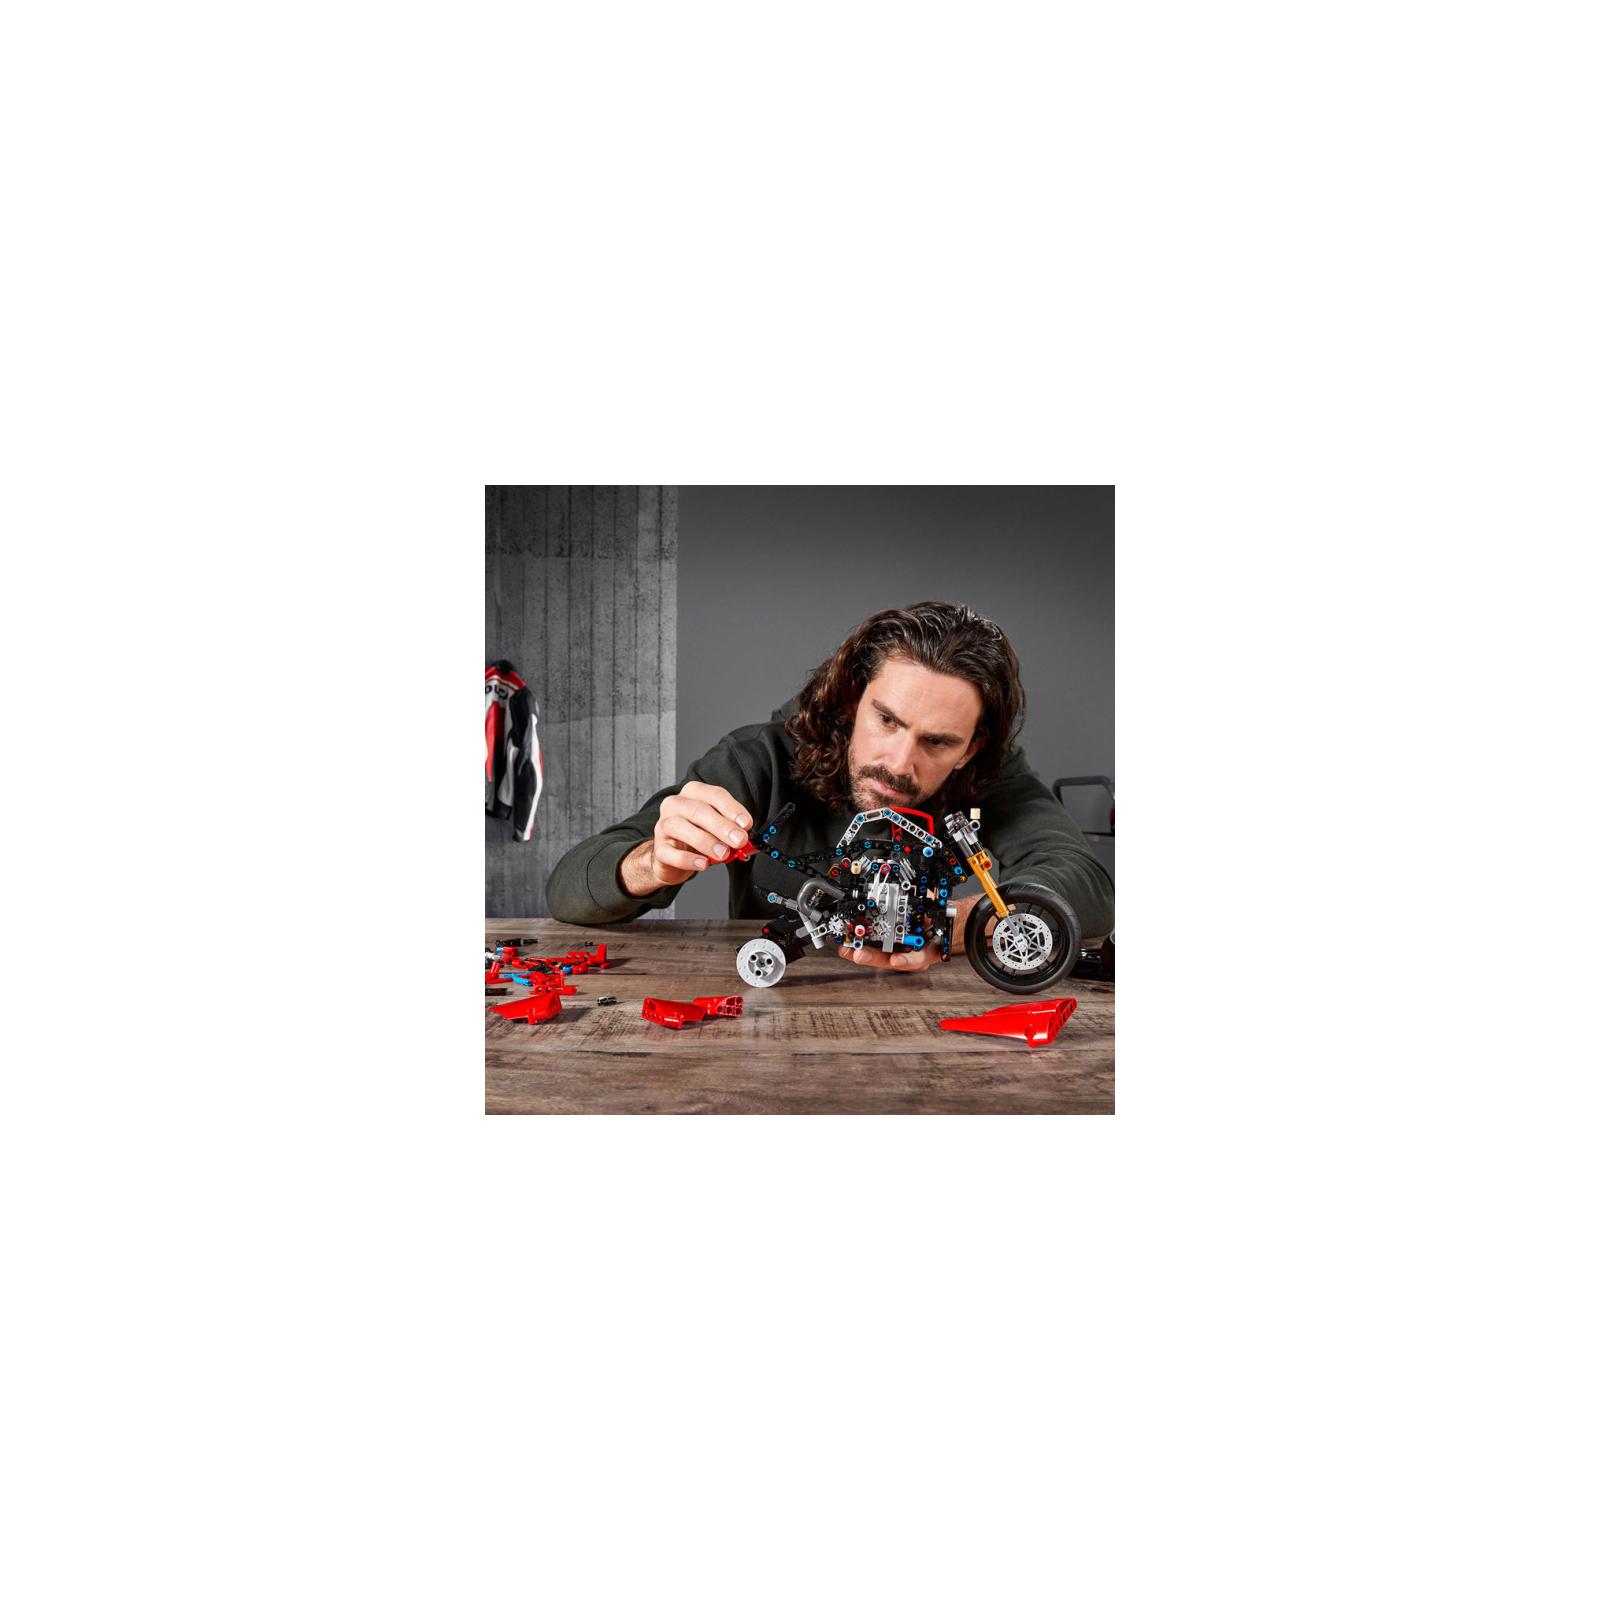 Конструктор LEGO Technic Ducati Panigale V4 R 0 646 детали (42107) изображение 11